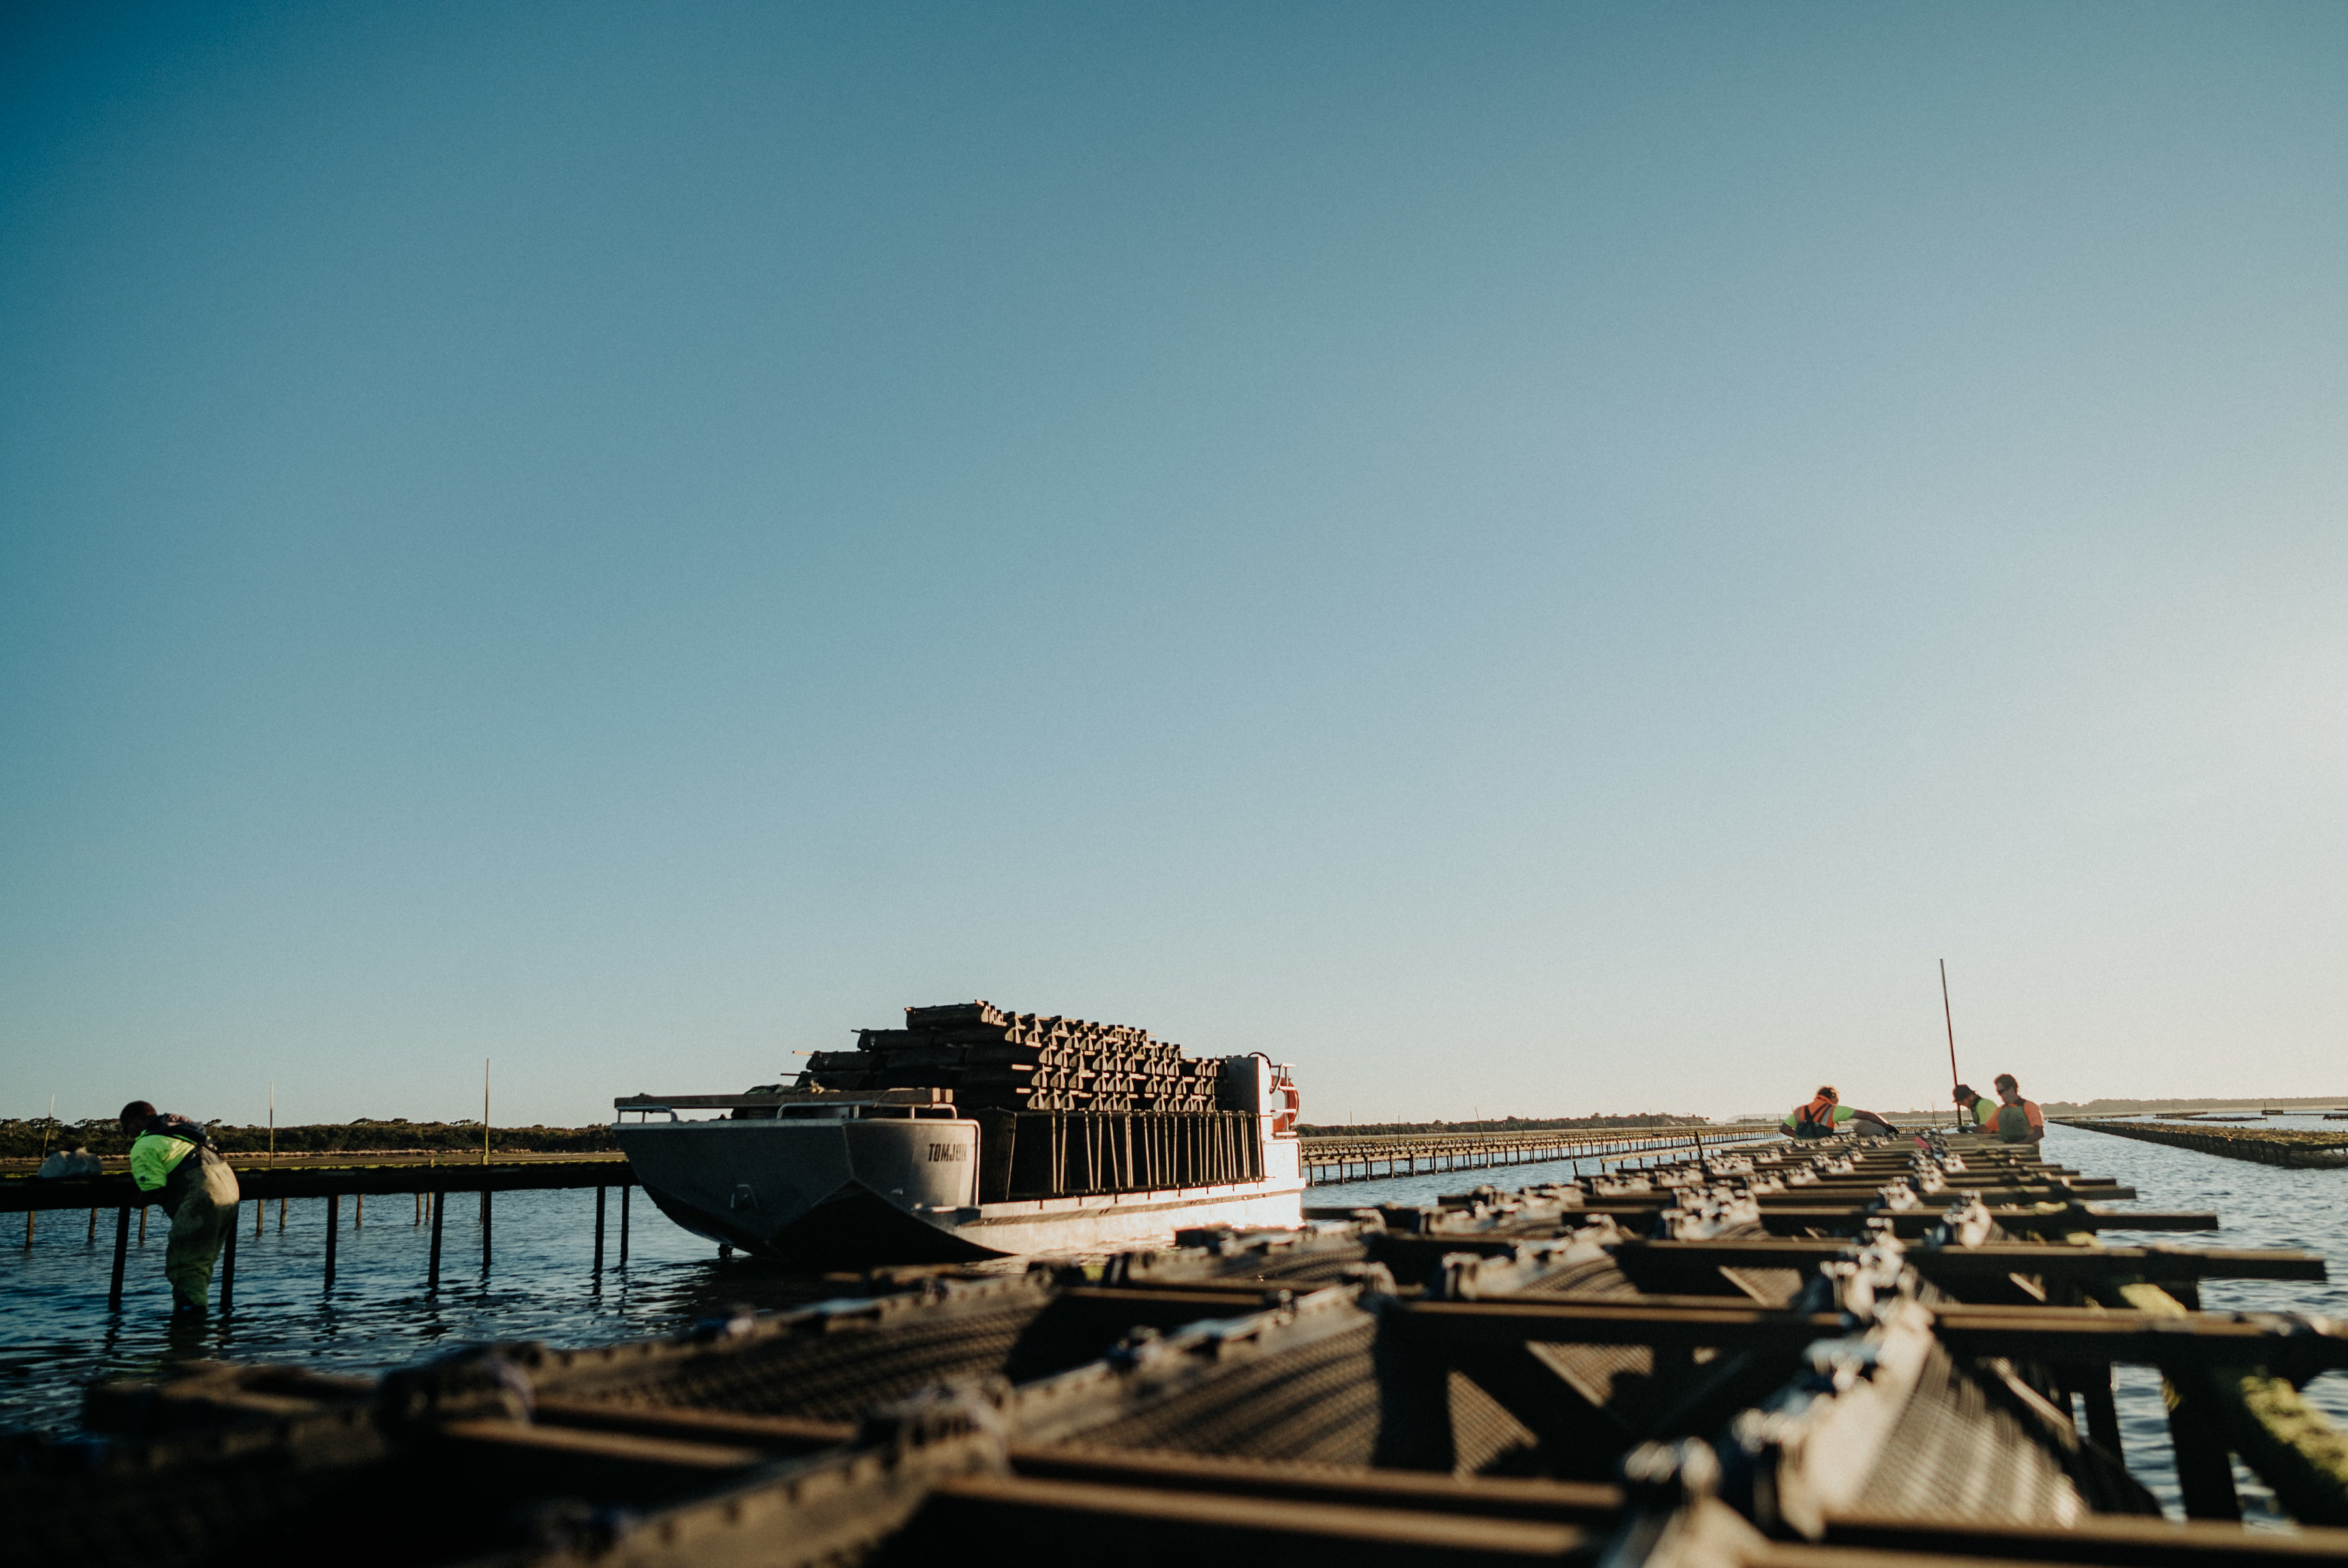 Tarkine-fresh-oyster-Andy-27